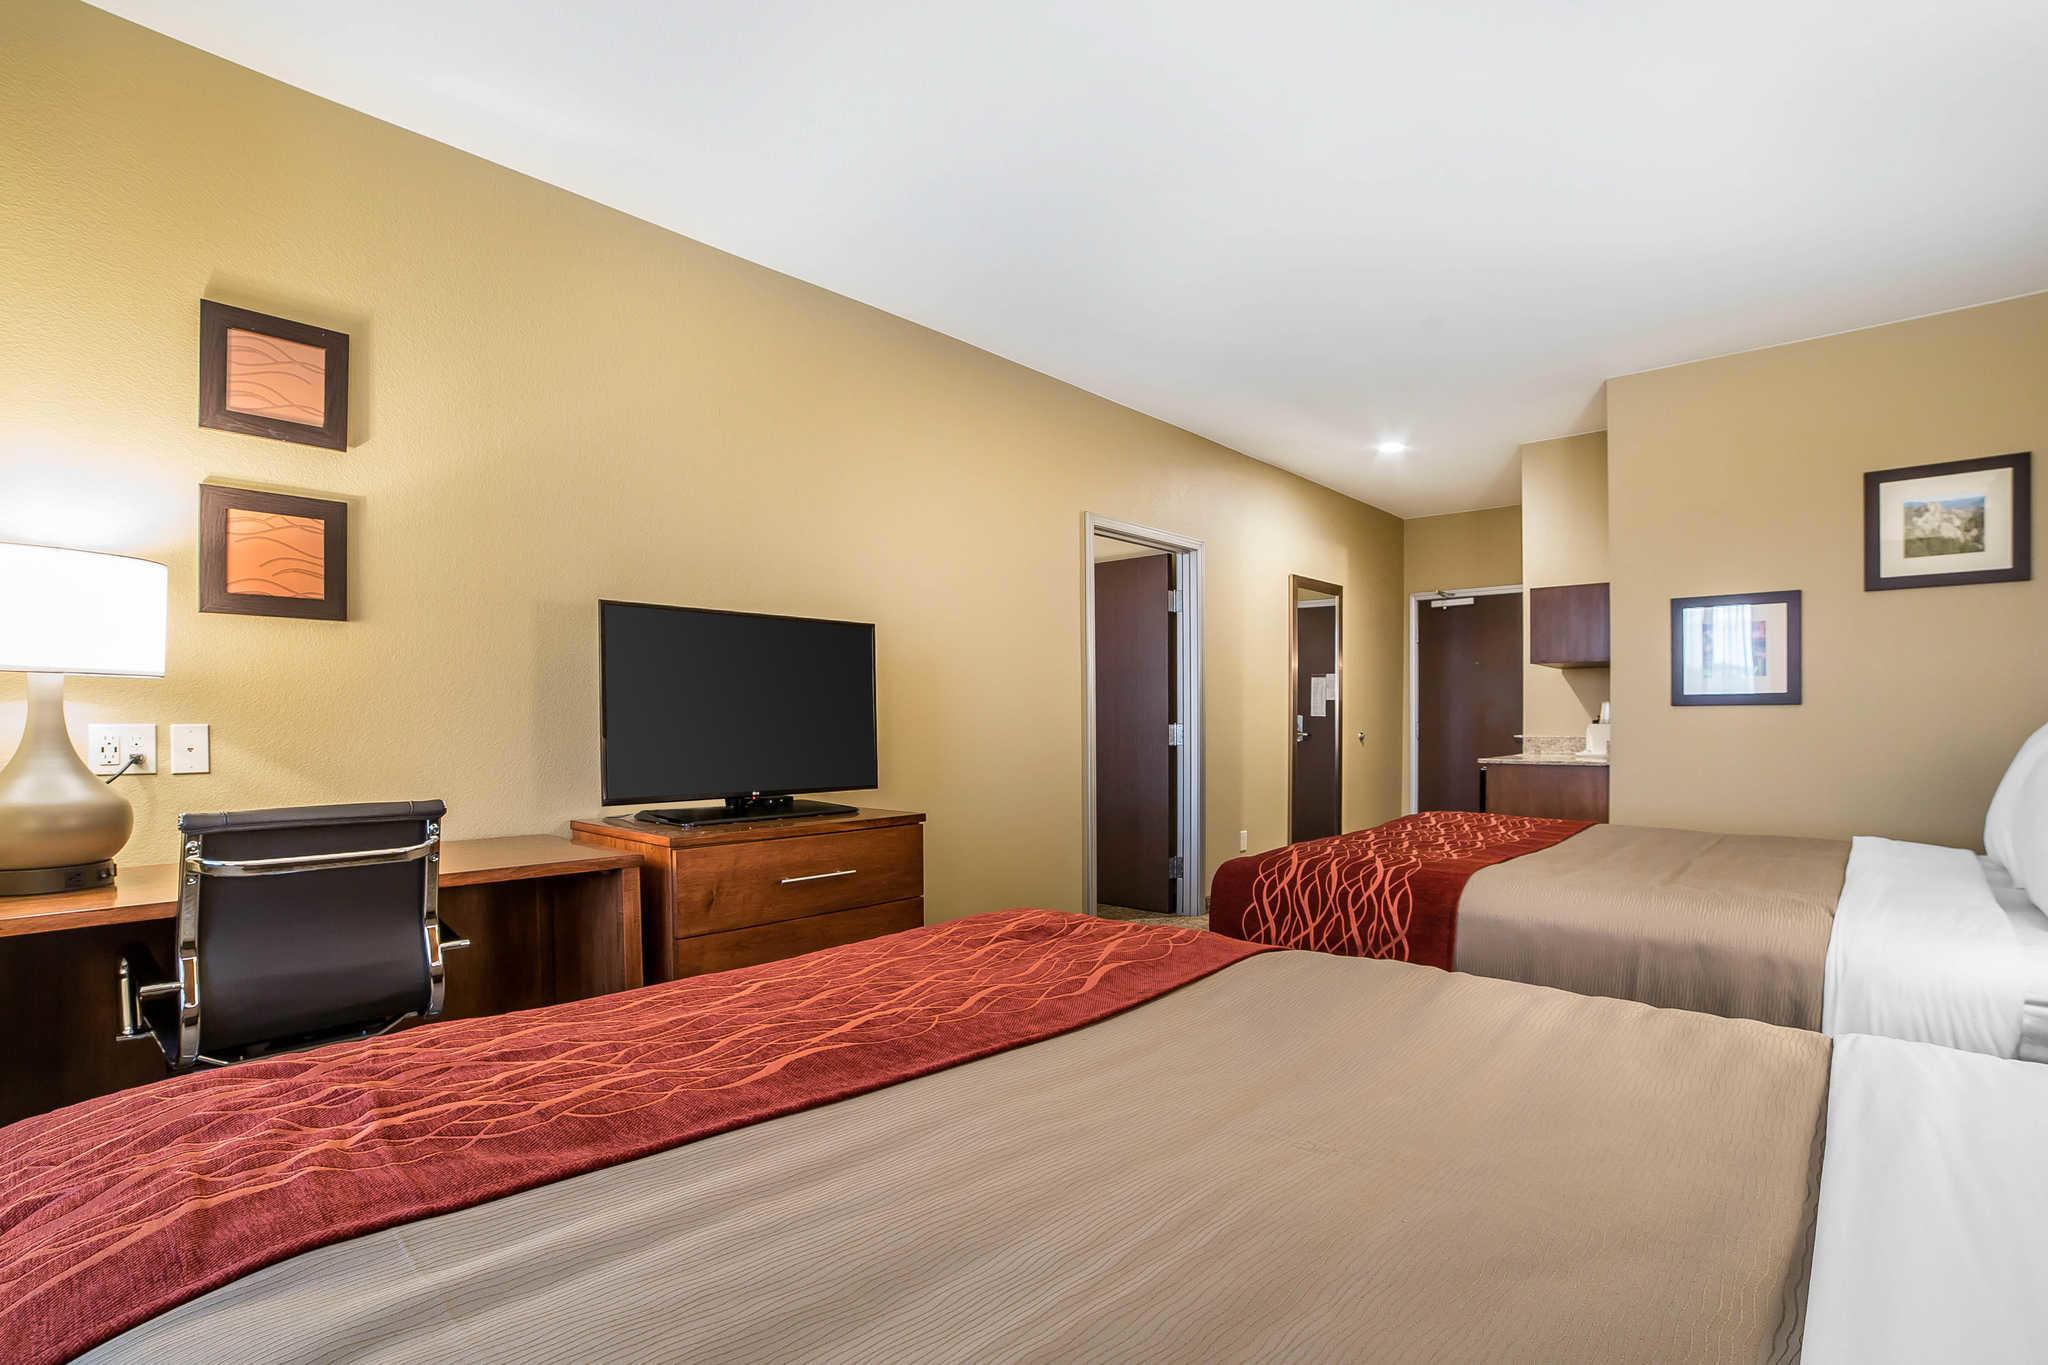 Comfort Inn & Suites Near Mt. Rushmore image 23